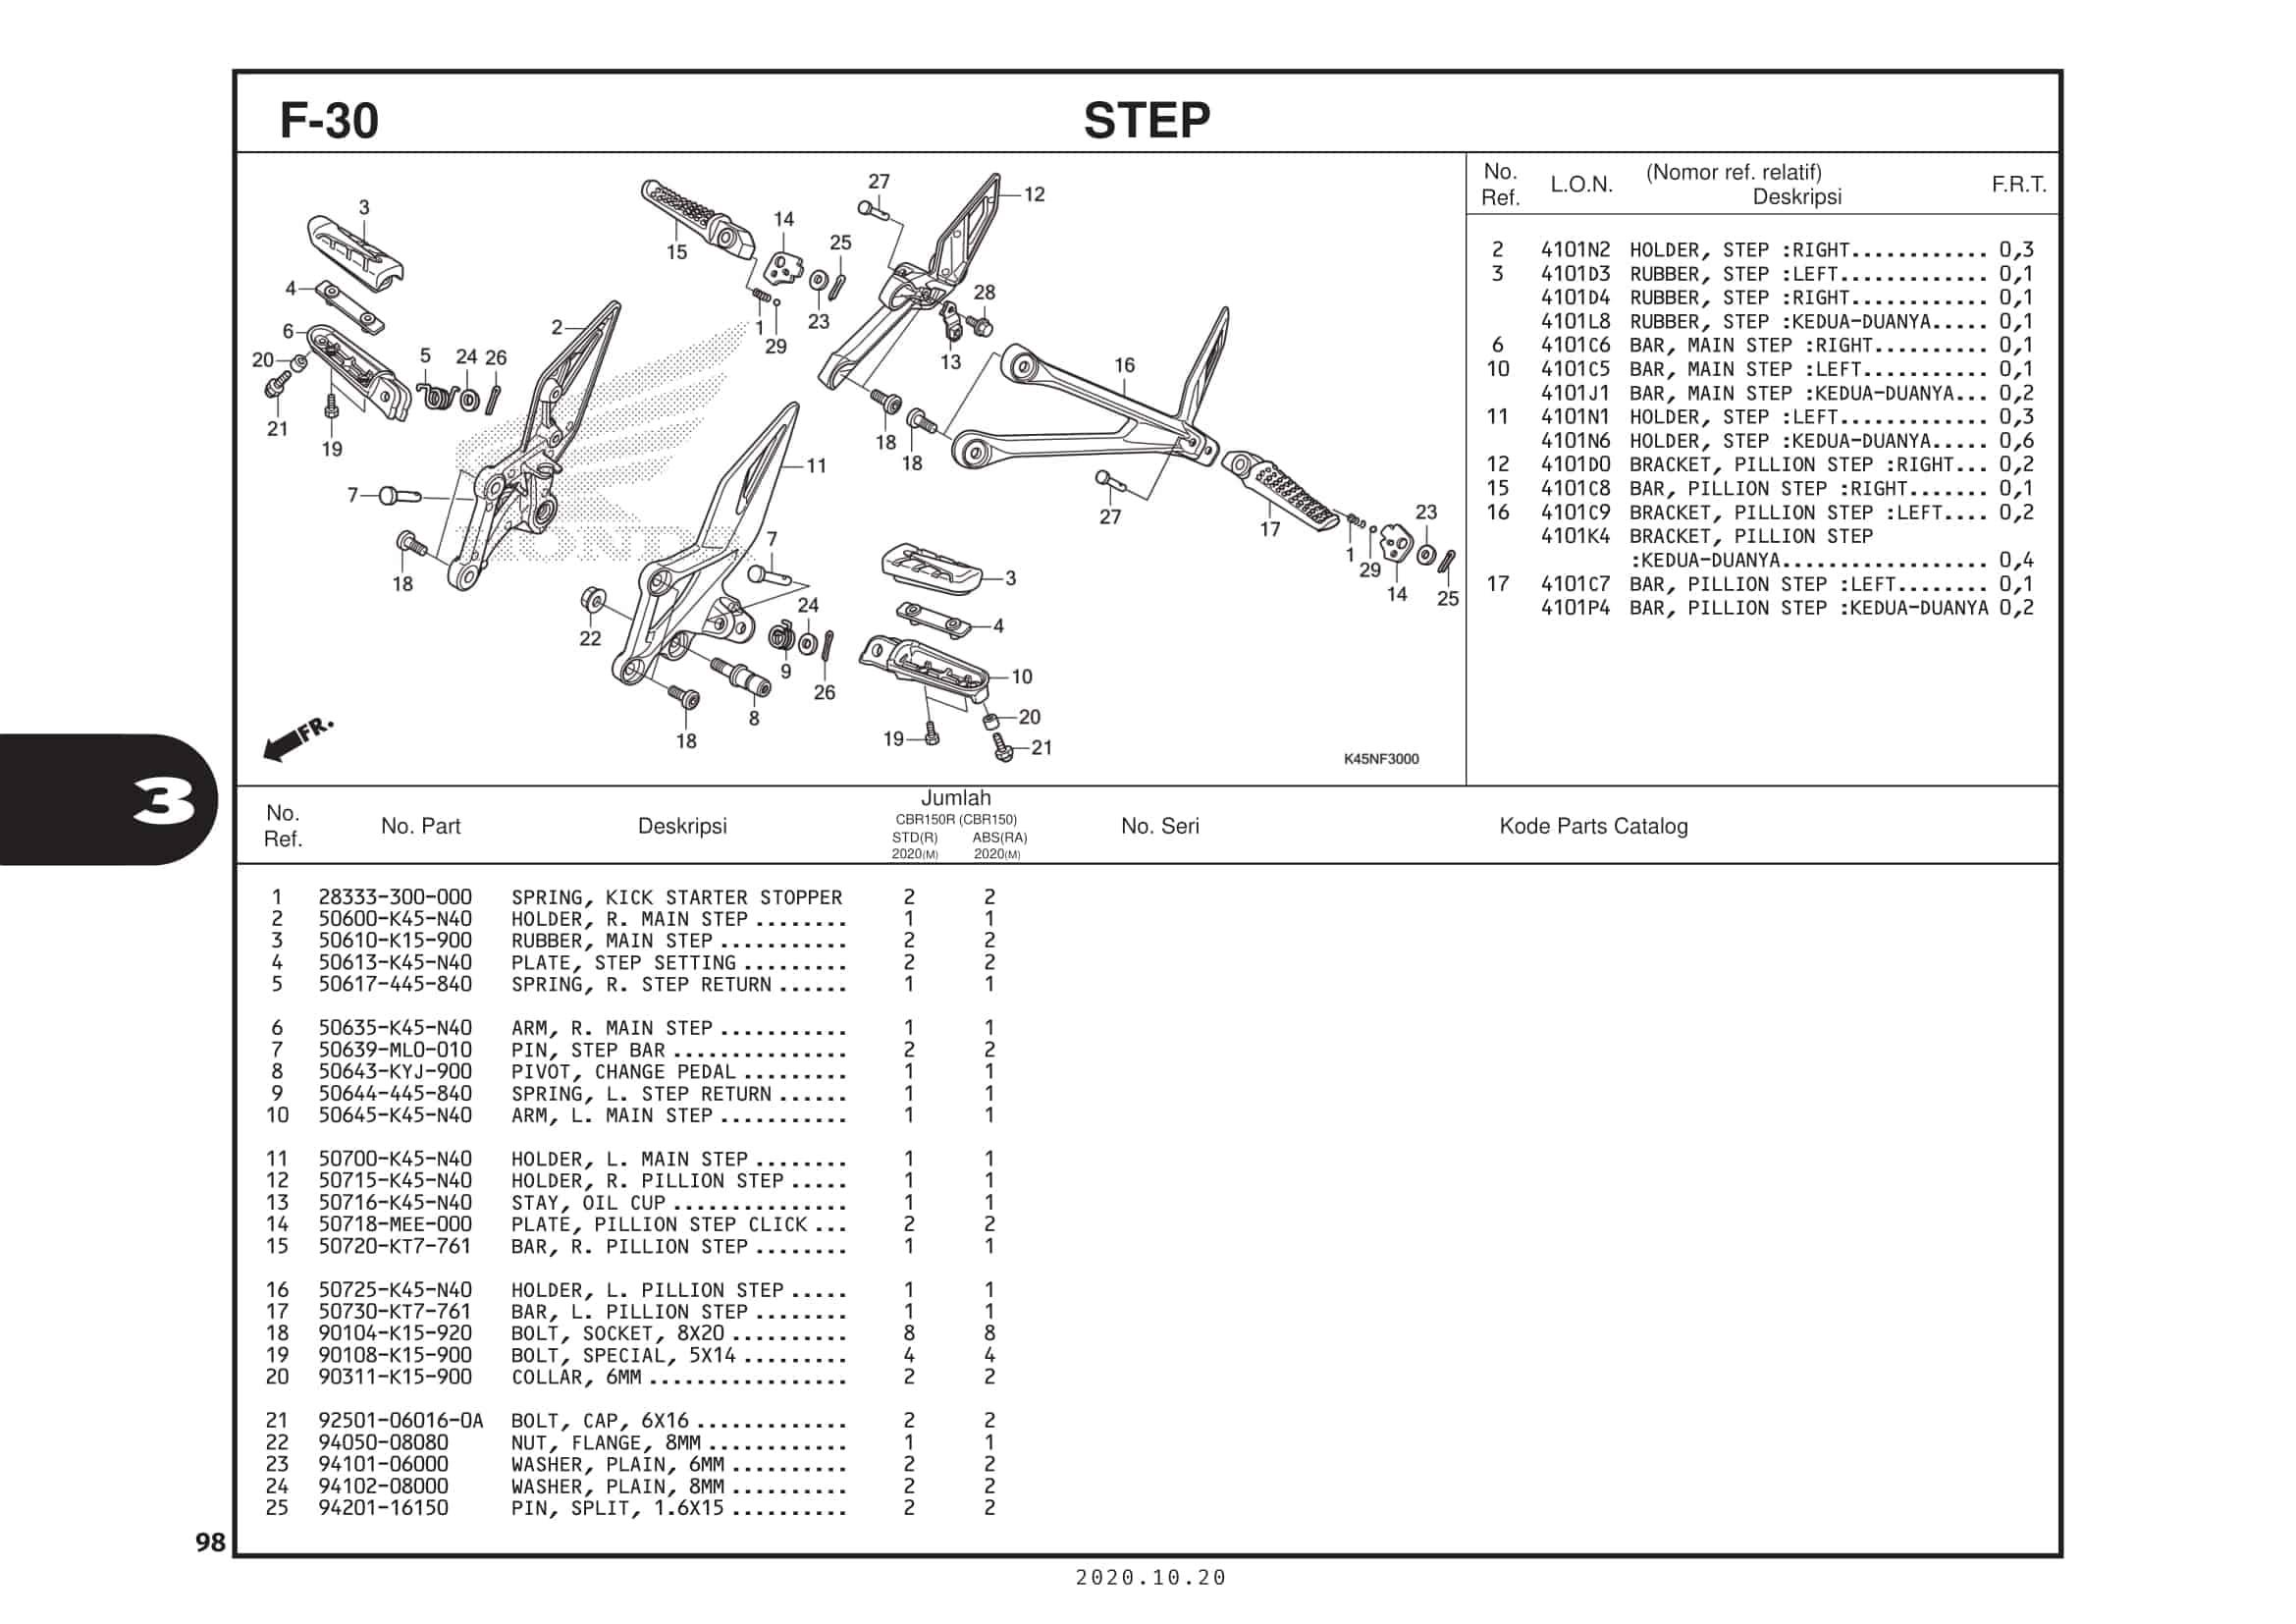 F-30 Step